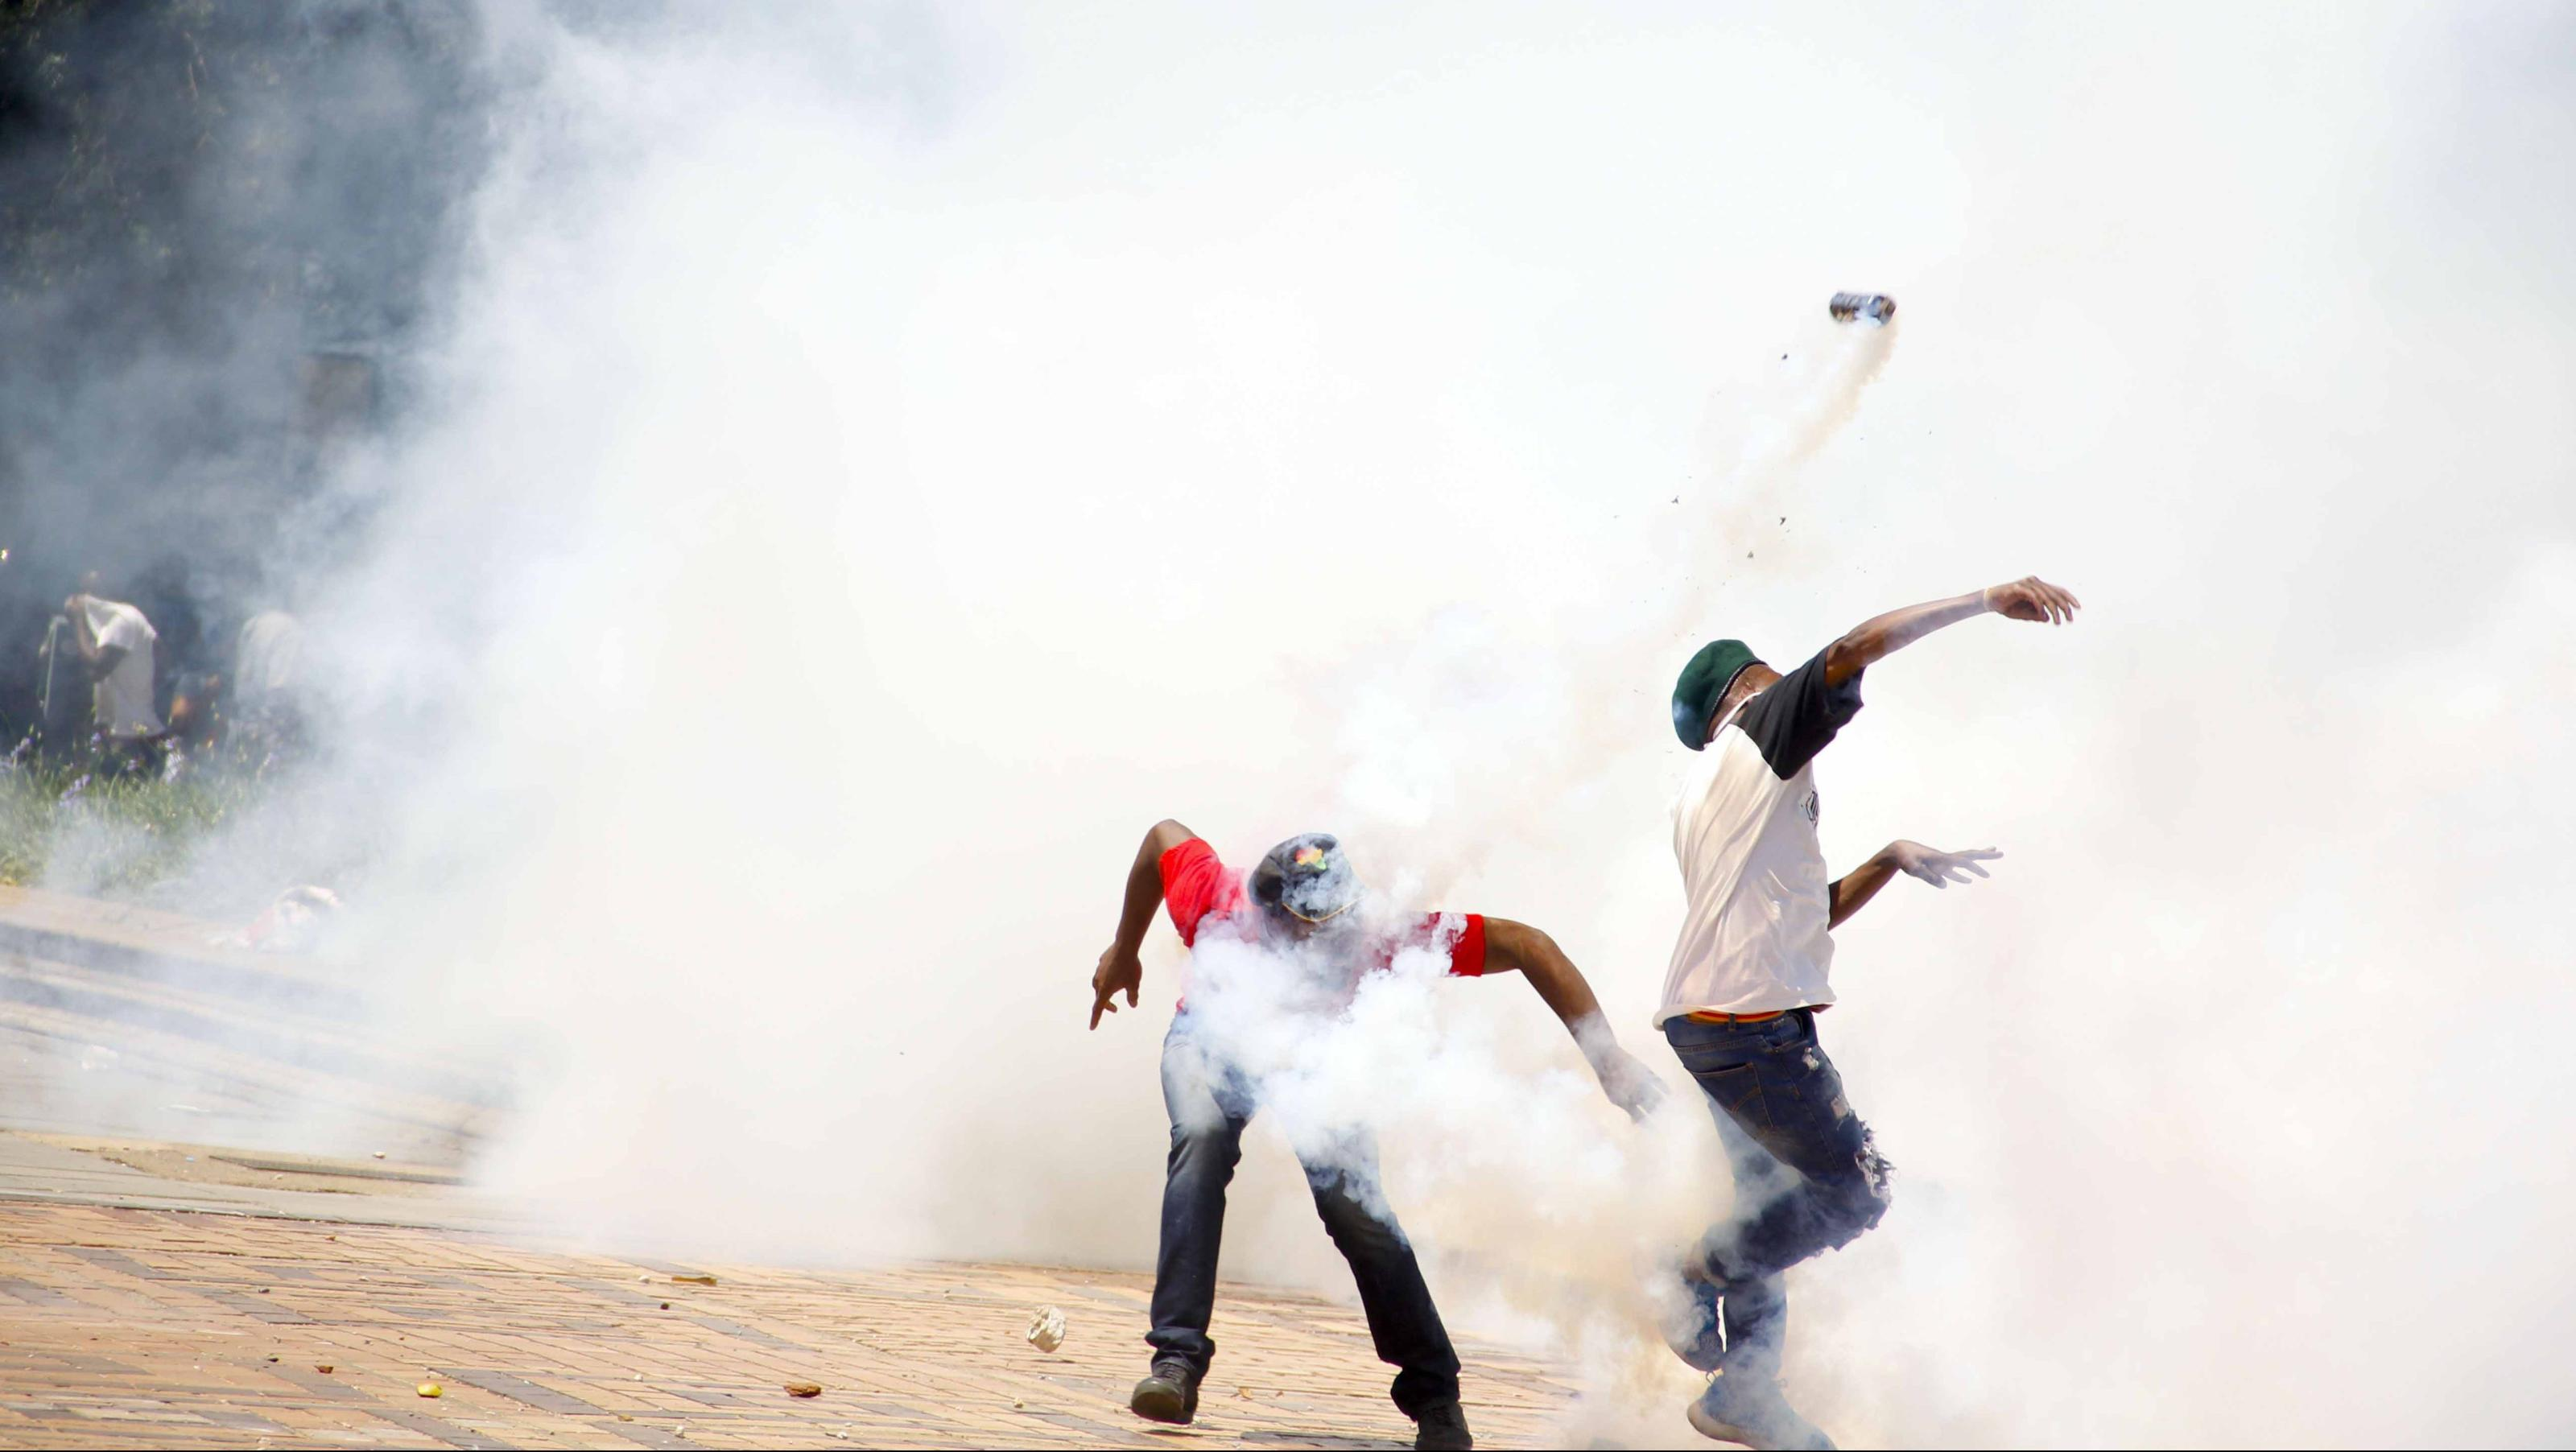 South Africa post-apartheid photos by David Goldblatt workshop